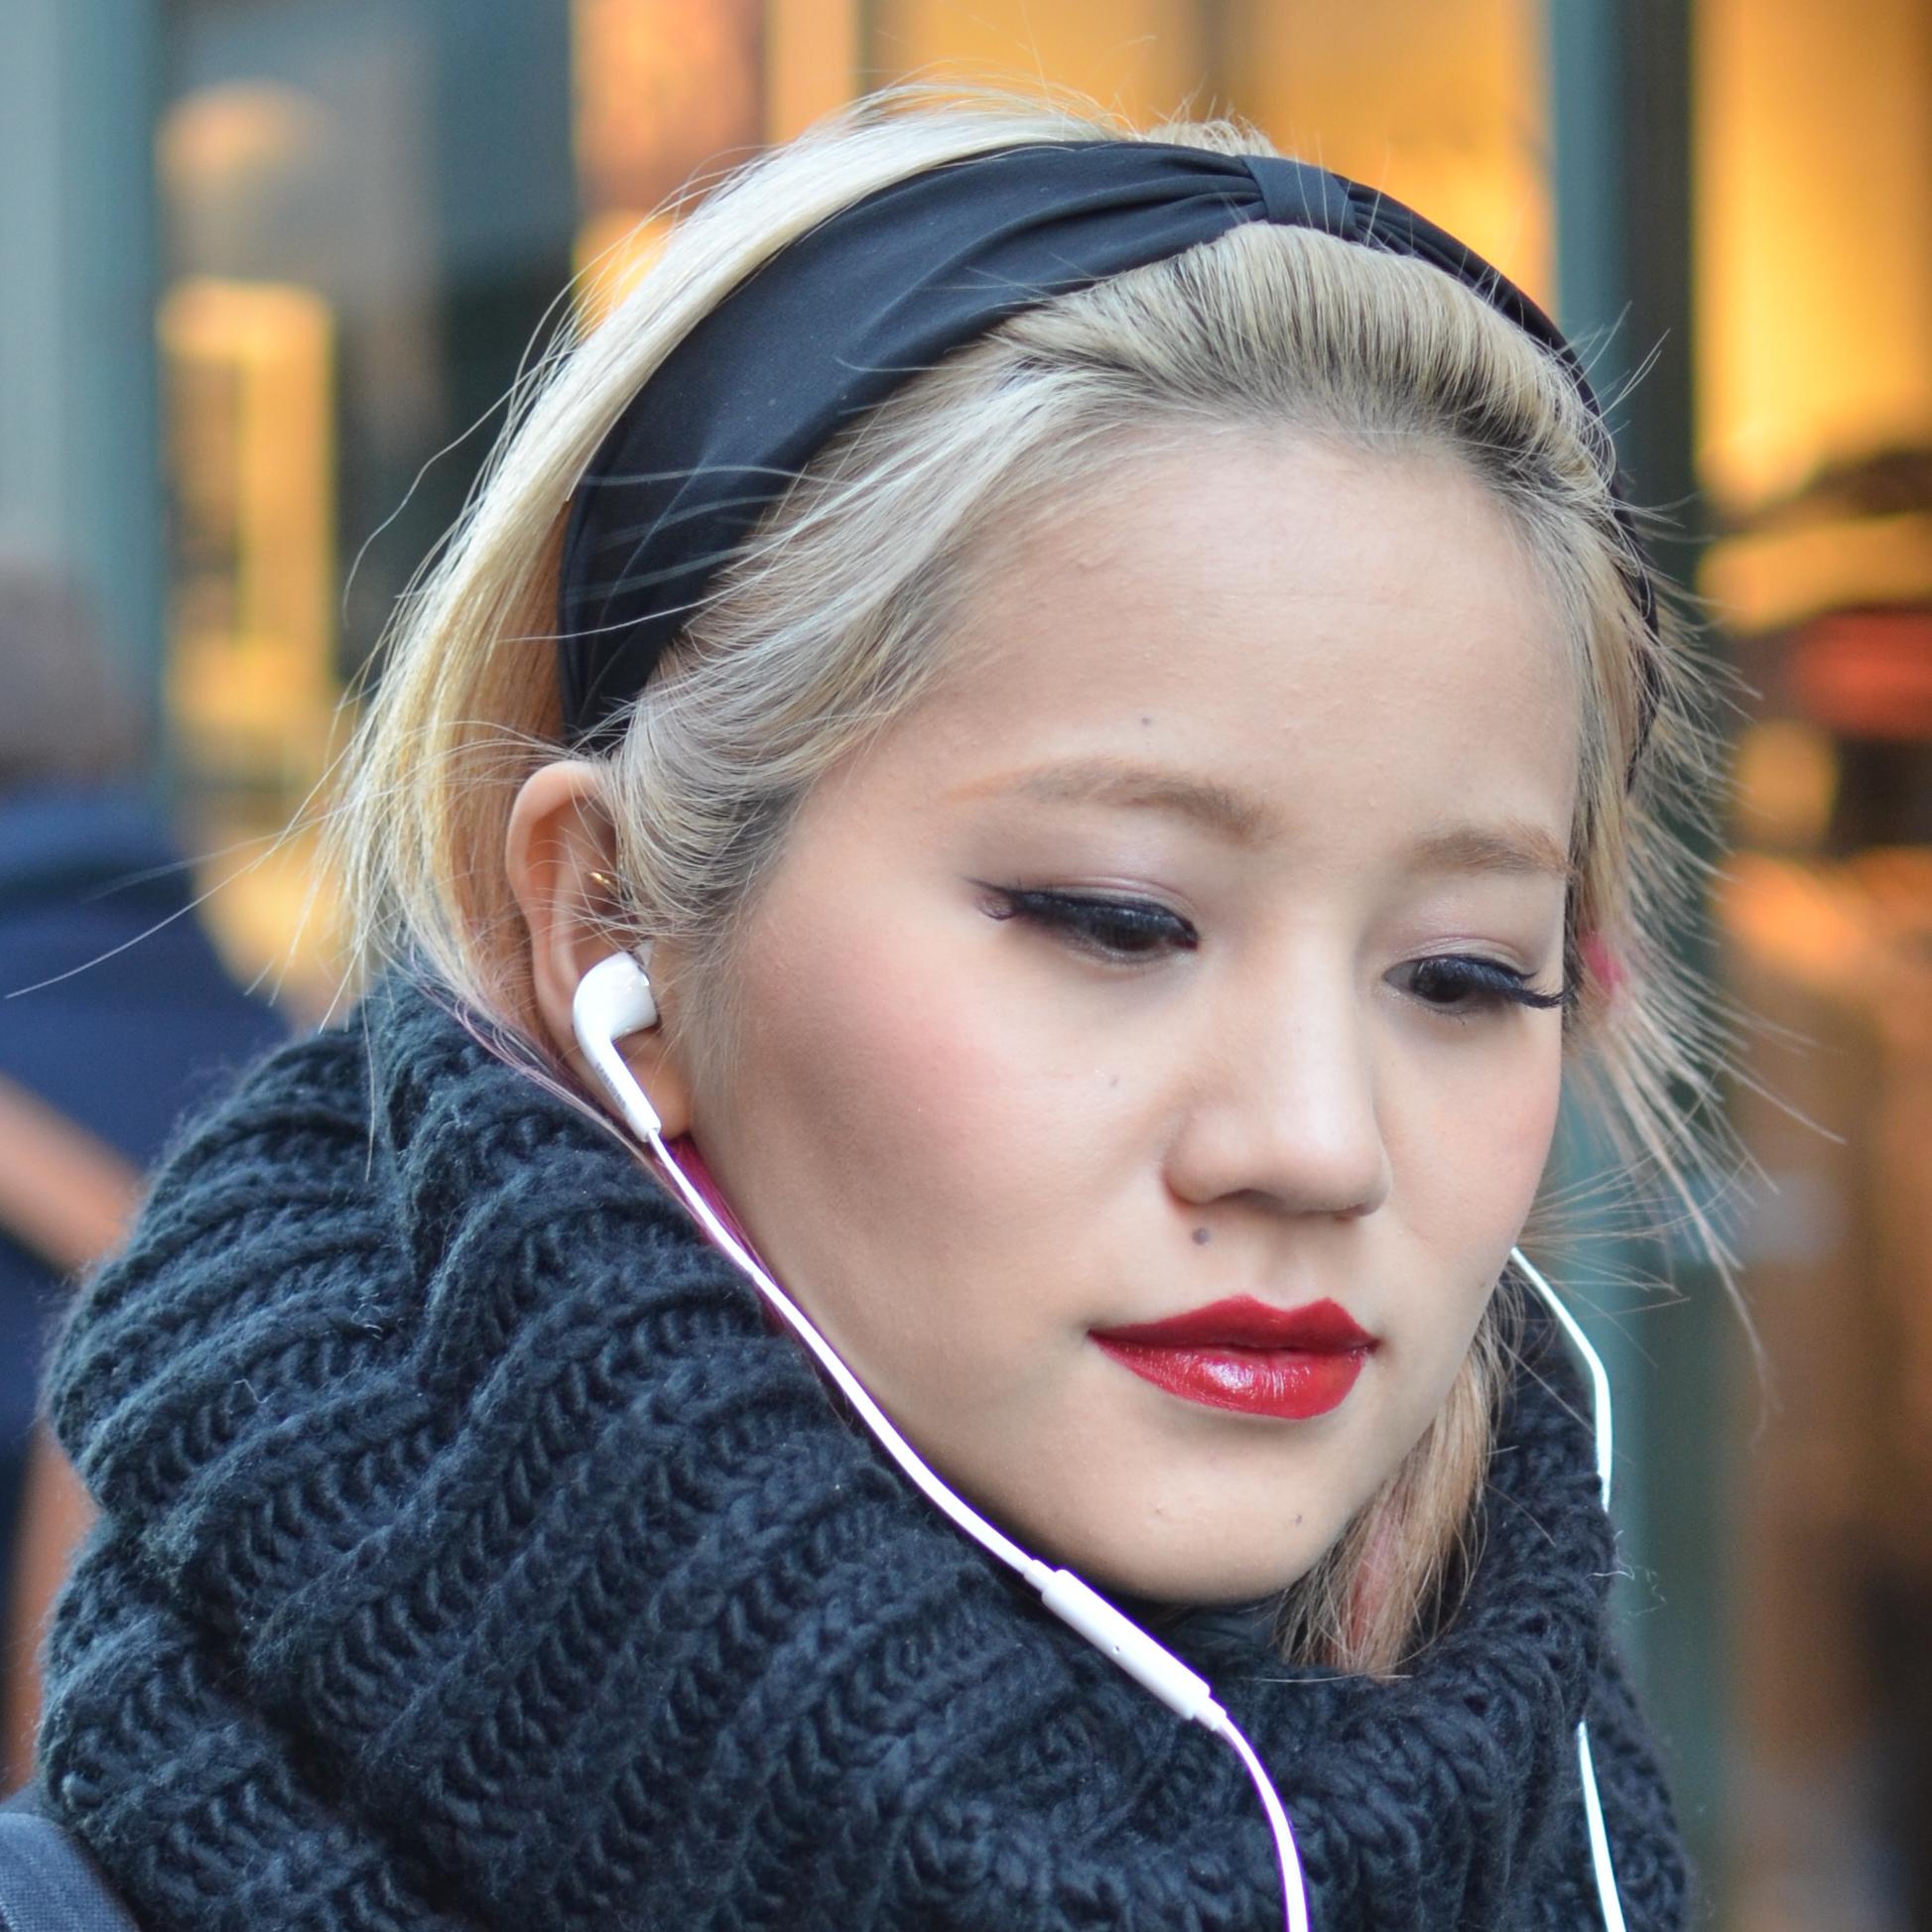 blonde Asian woman